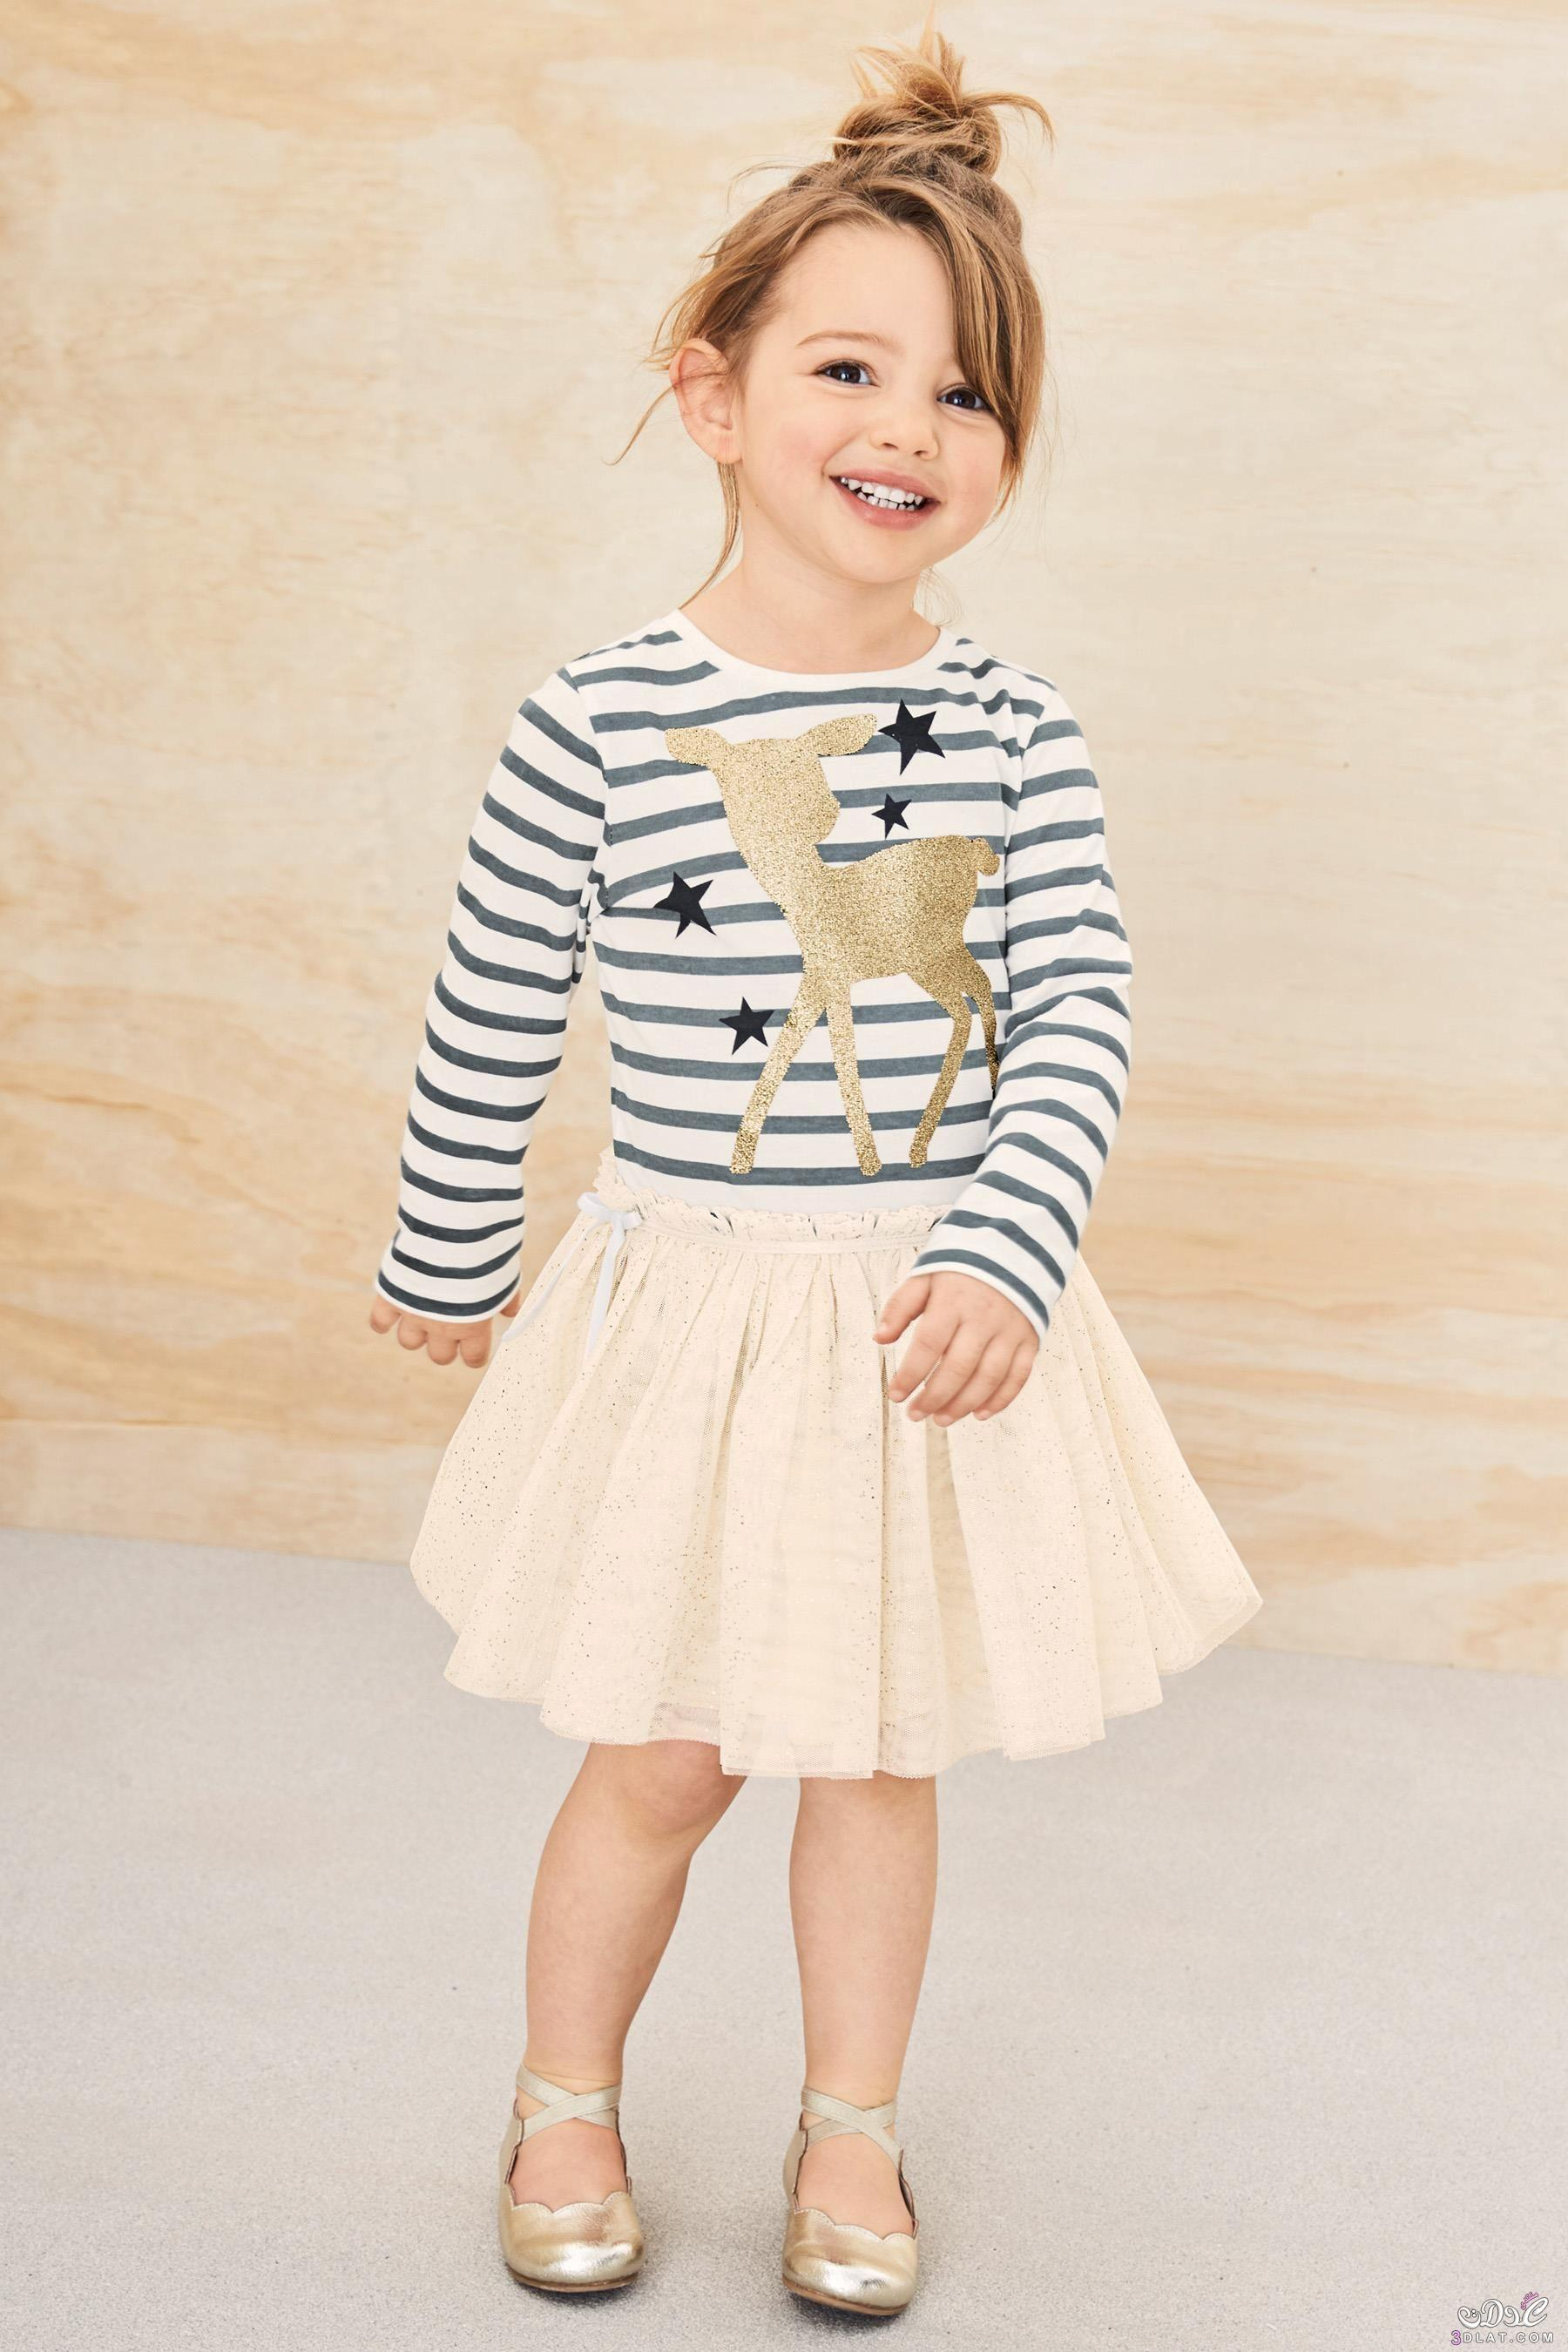 3e25c8c51 ملابس بنوتات لشتاء 2020..اجدد موديلات ملابس الاطفال..ملابس اطفال ...